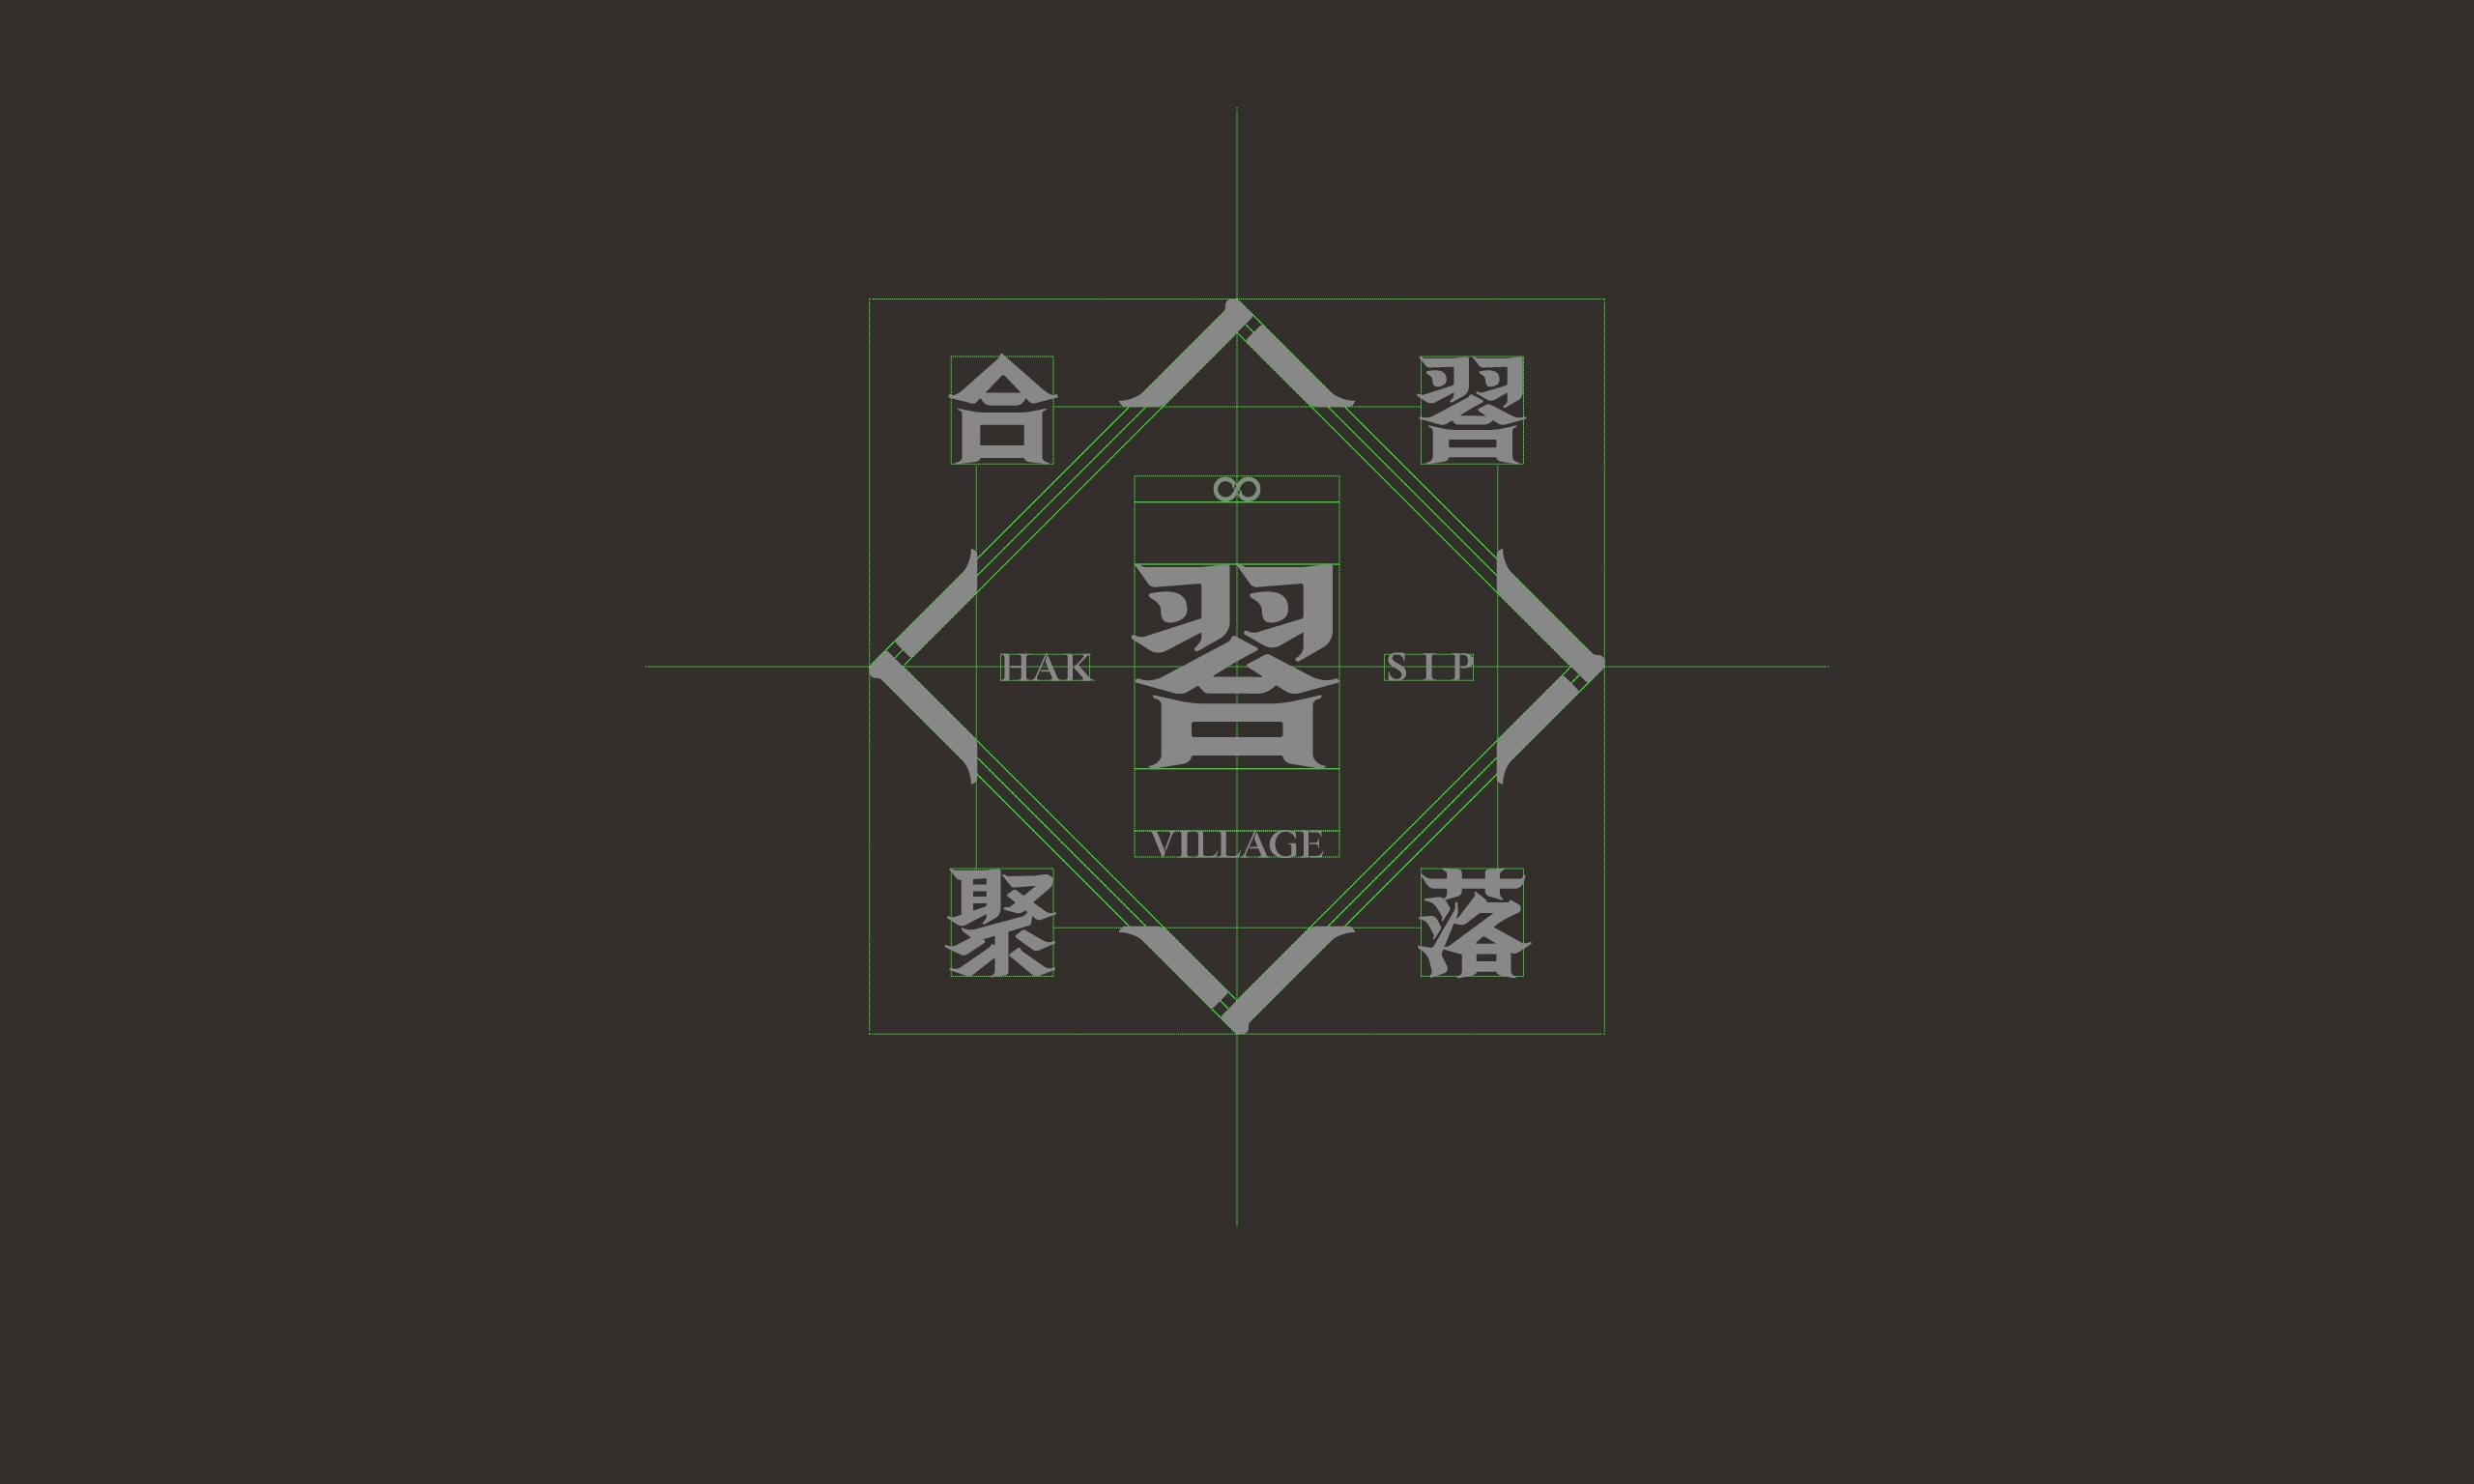 HAKSIP Village - Taiwan community design